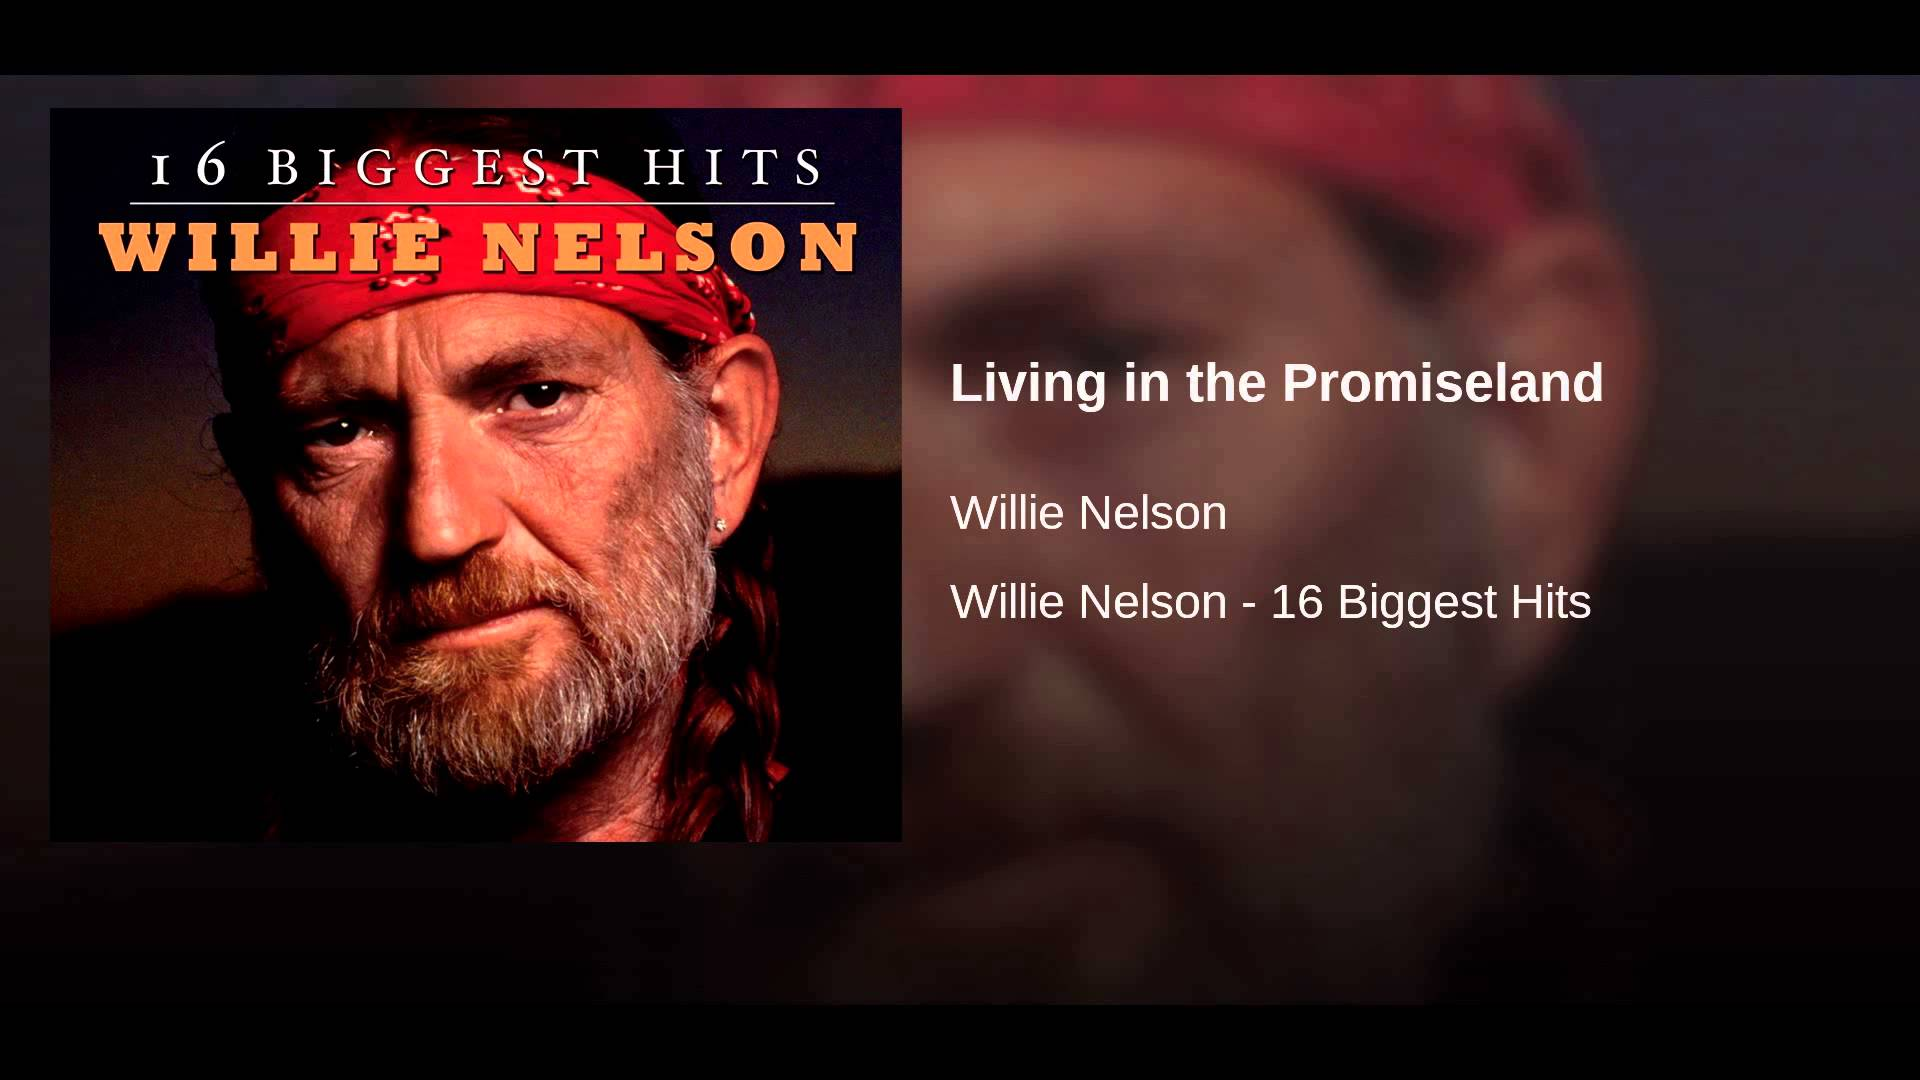 Willie Nelson:  Living in the Promiseland